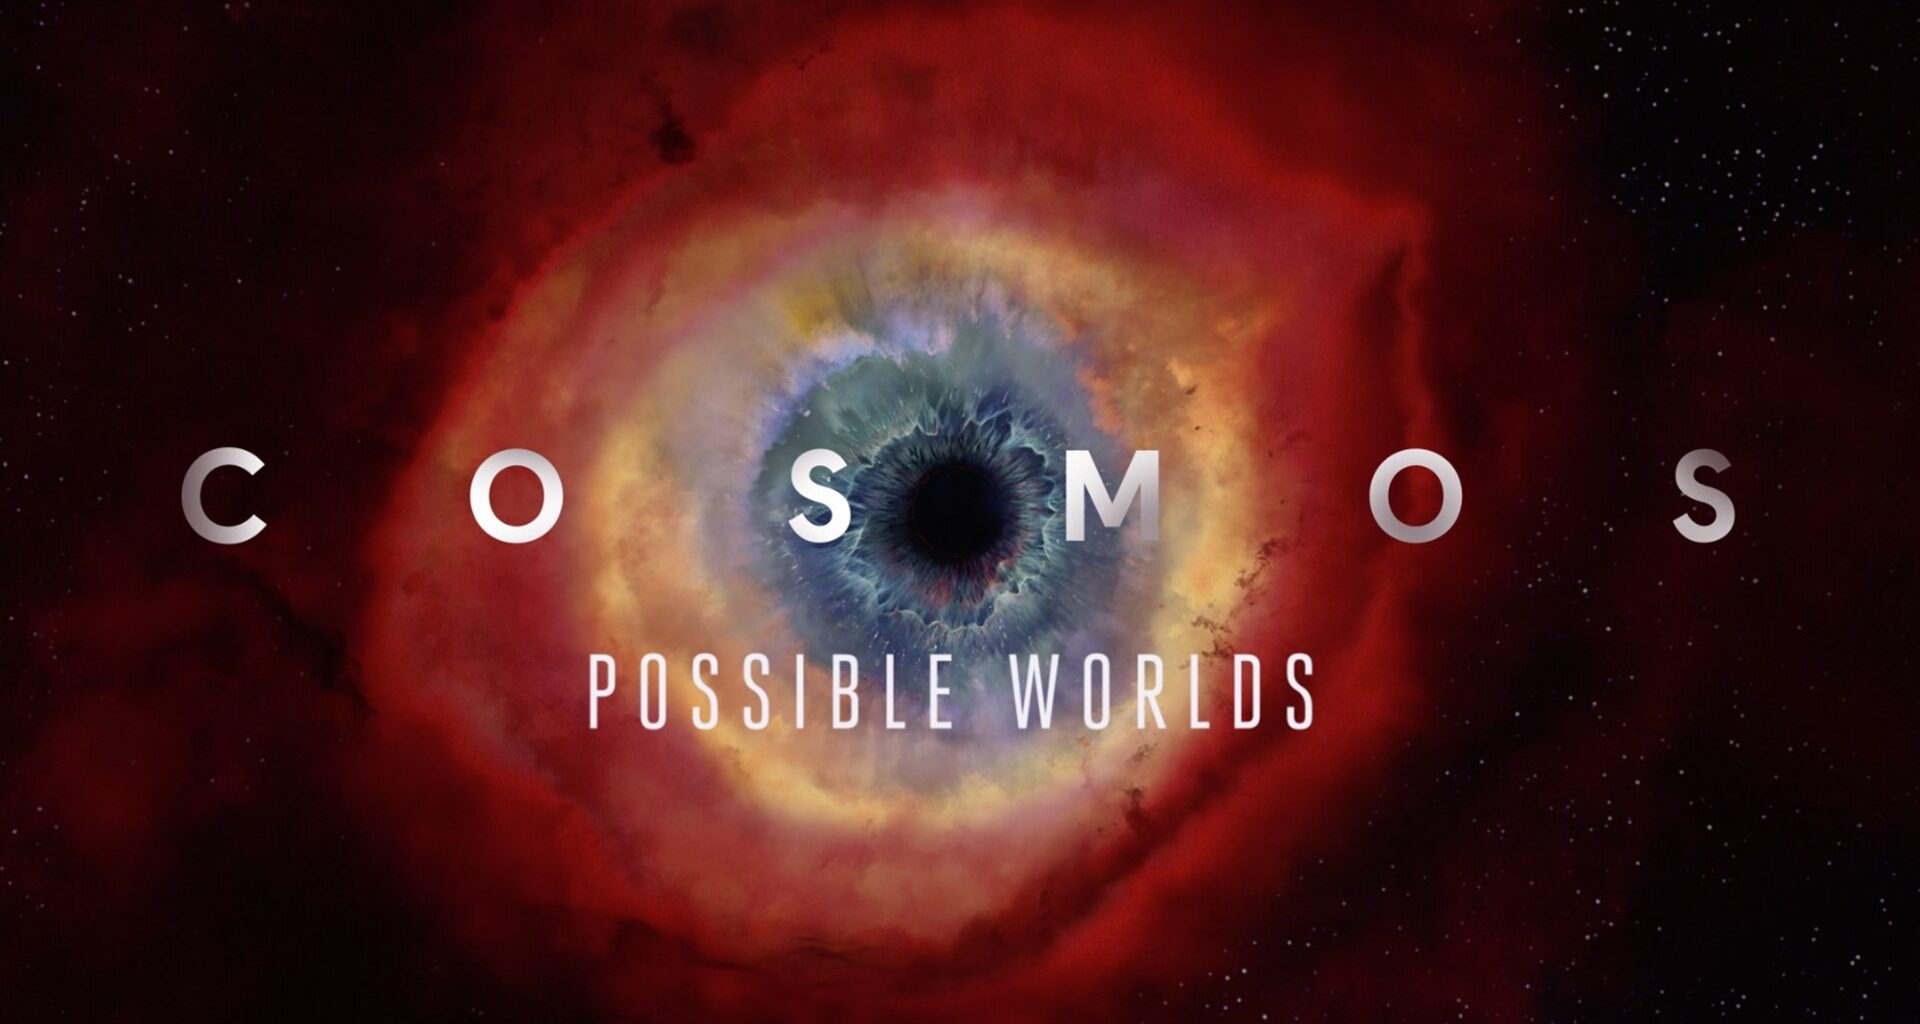 Cosmos mundos